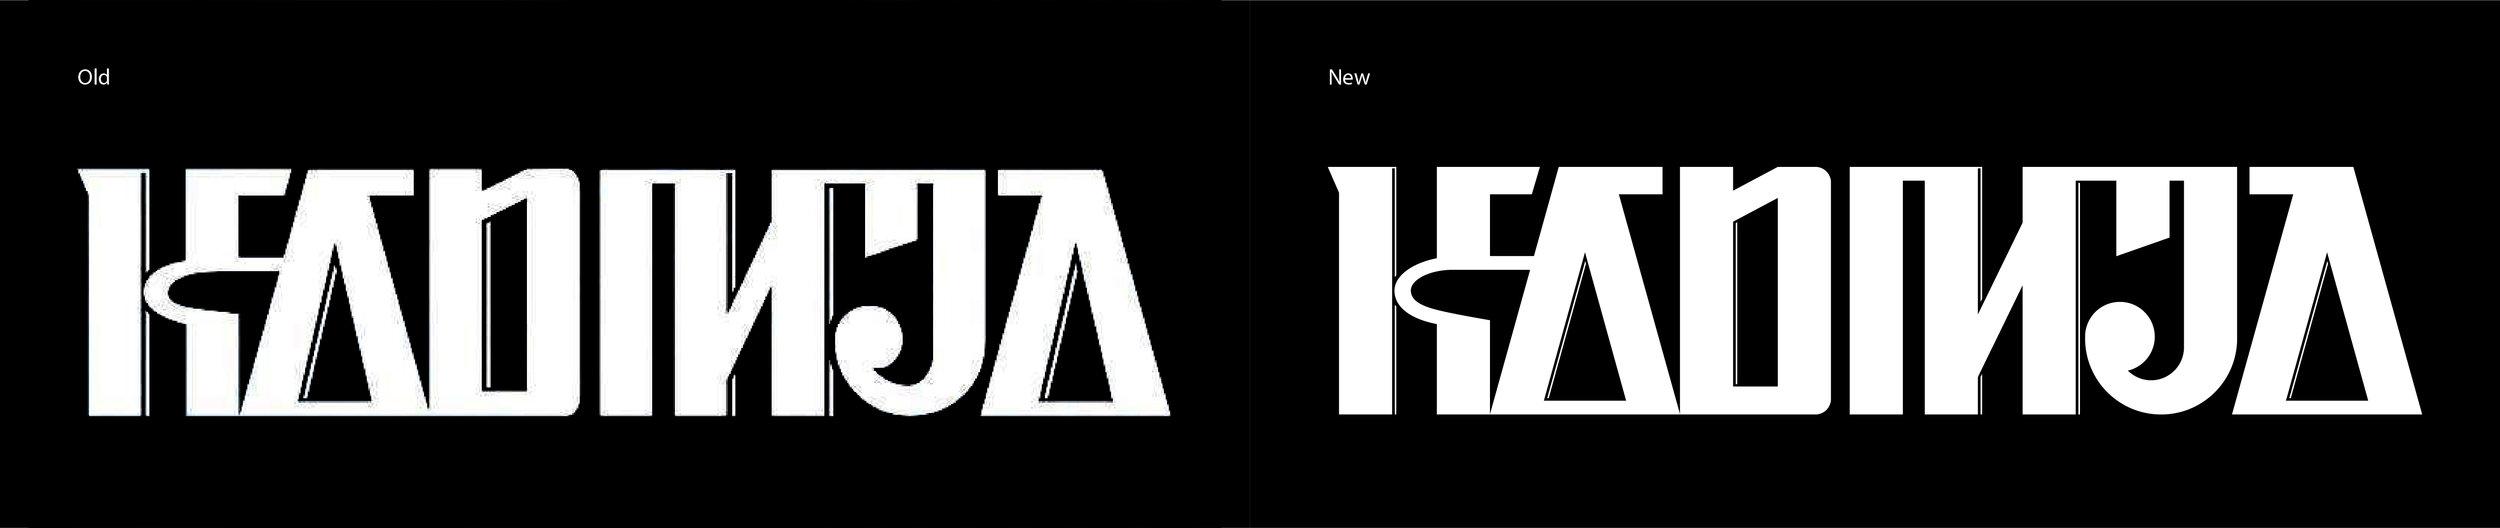 Kadinja logo redux-02.jpg